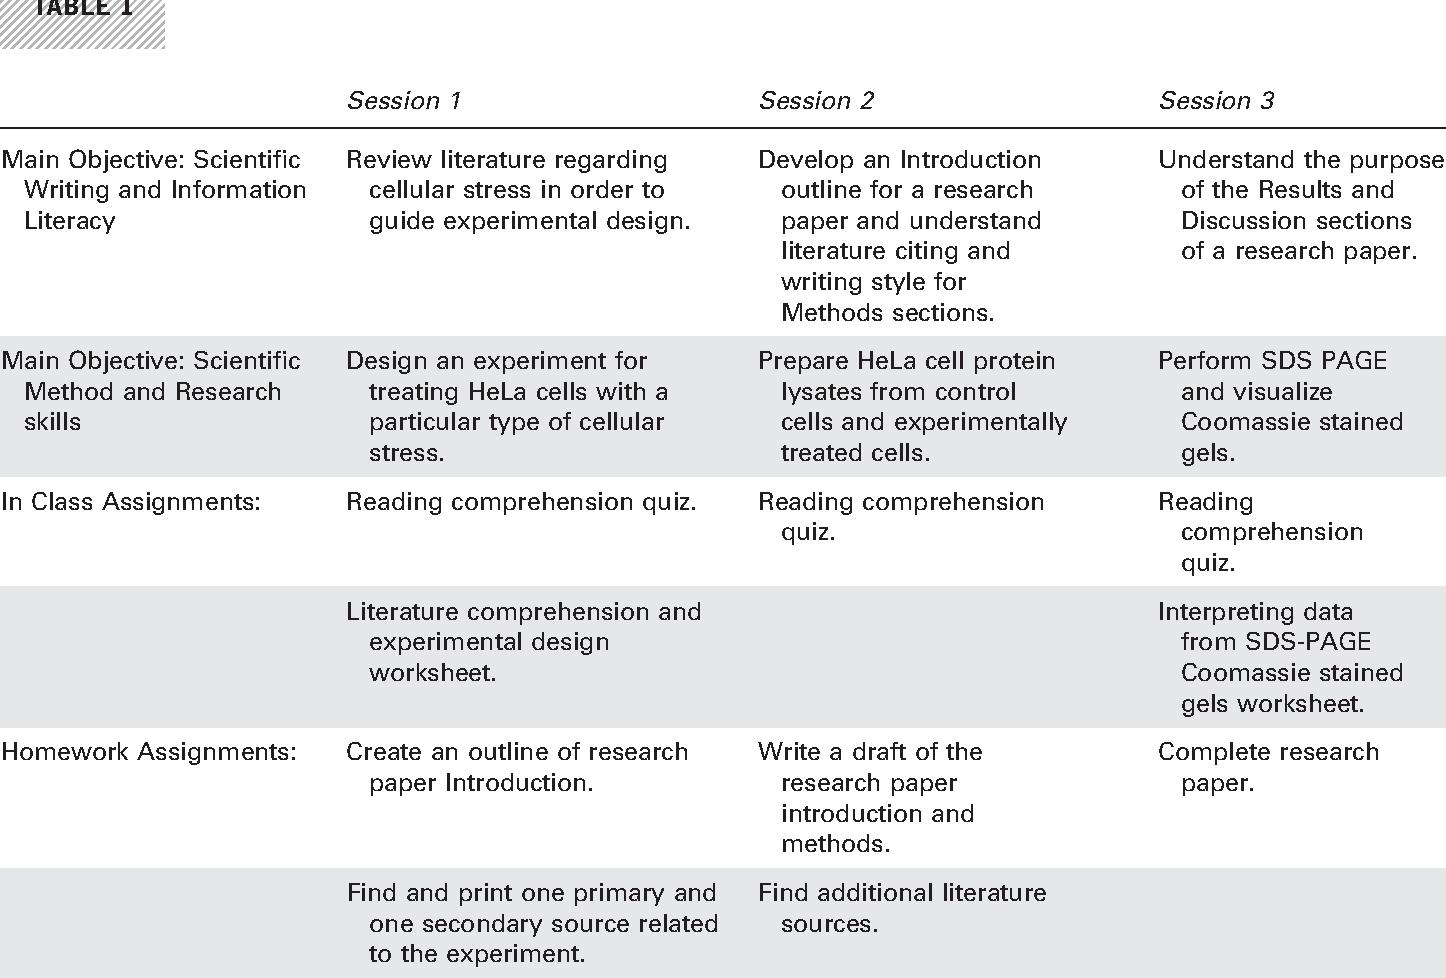 Scientific Method Experimental Design Worksheet